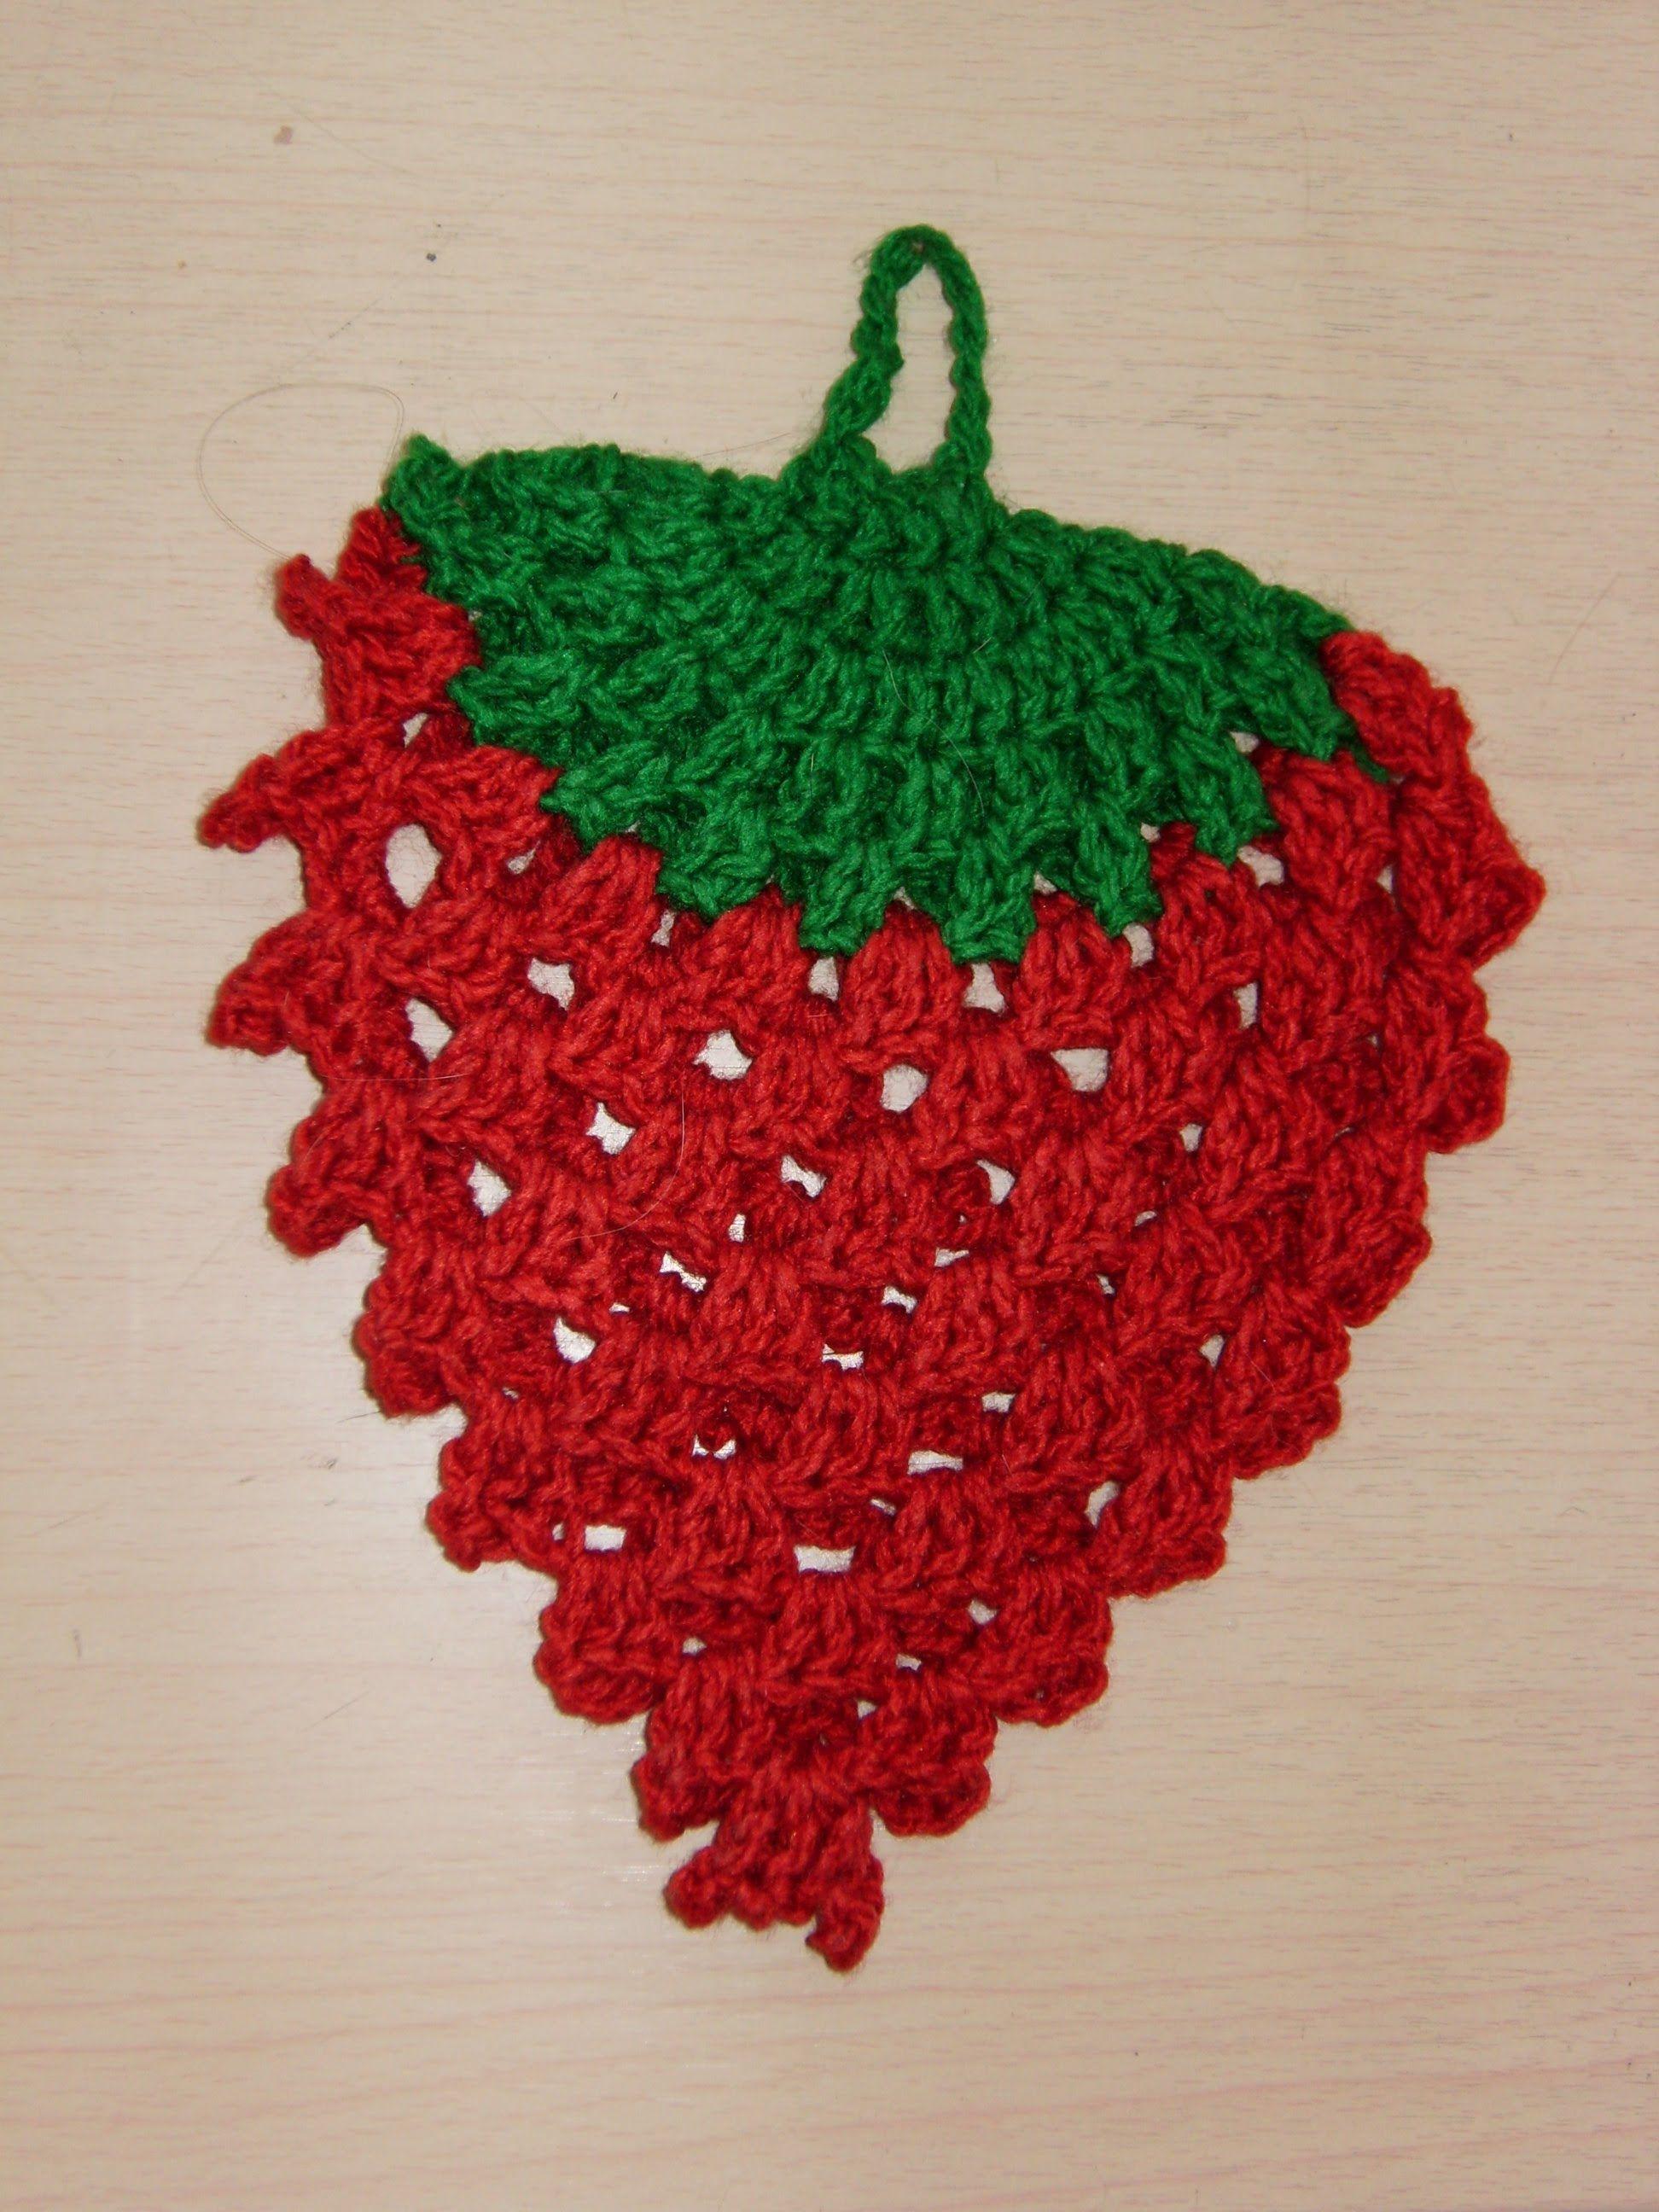 Hermosa Fresa Patrón Potholder Crochet Modelo - Manta de Tejer ...